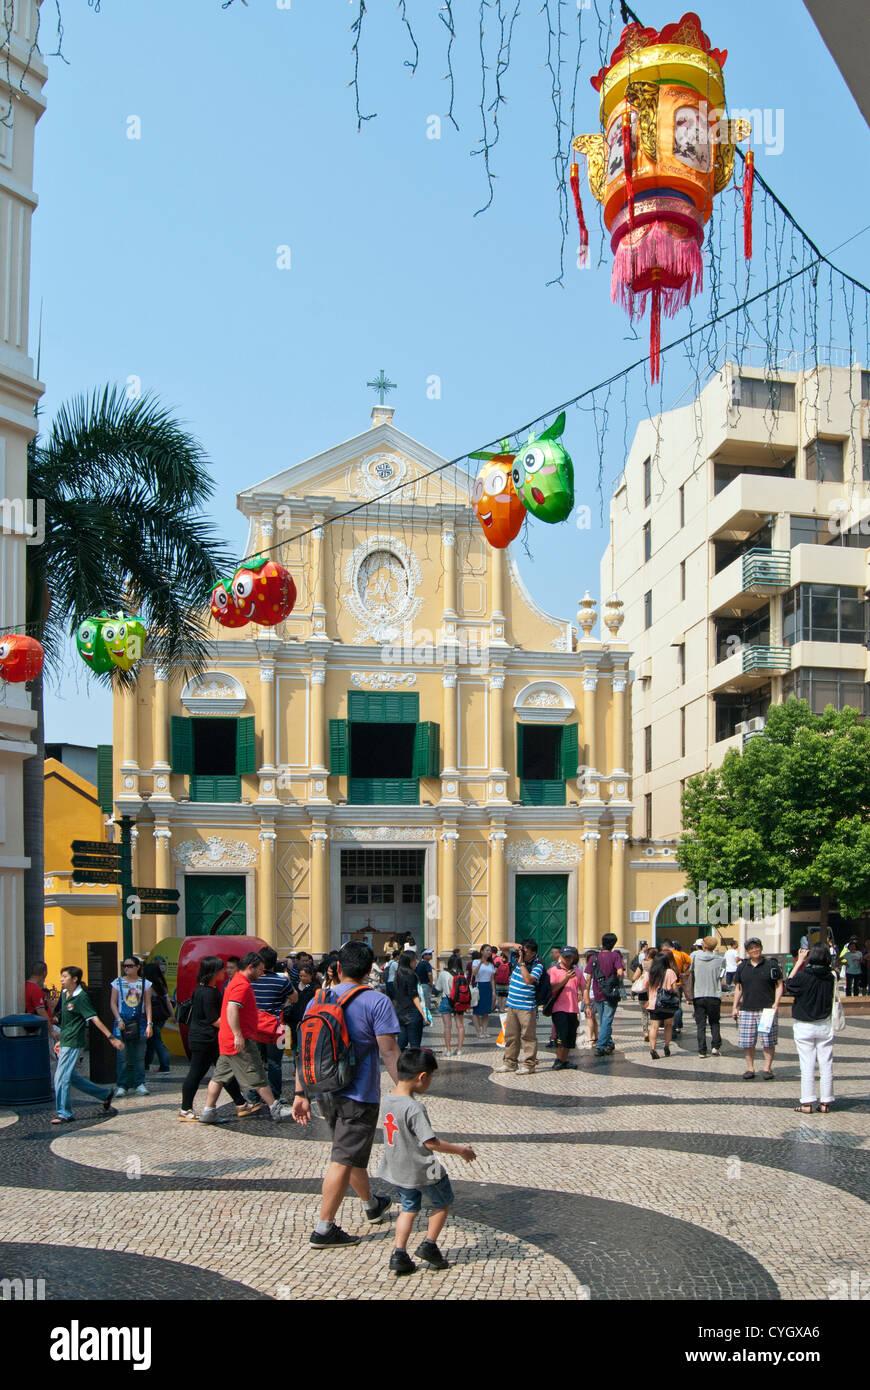 La Iglesia de San Domingo con decoraciones Mid-Autumn Festival, Macao Imagen De Stock